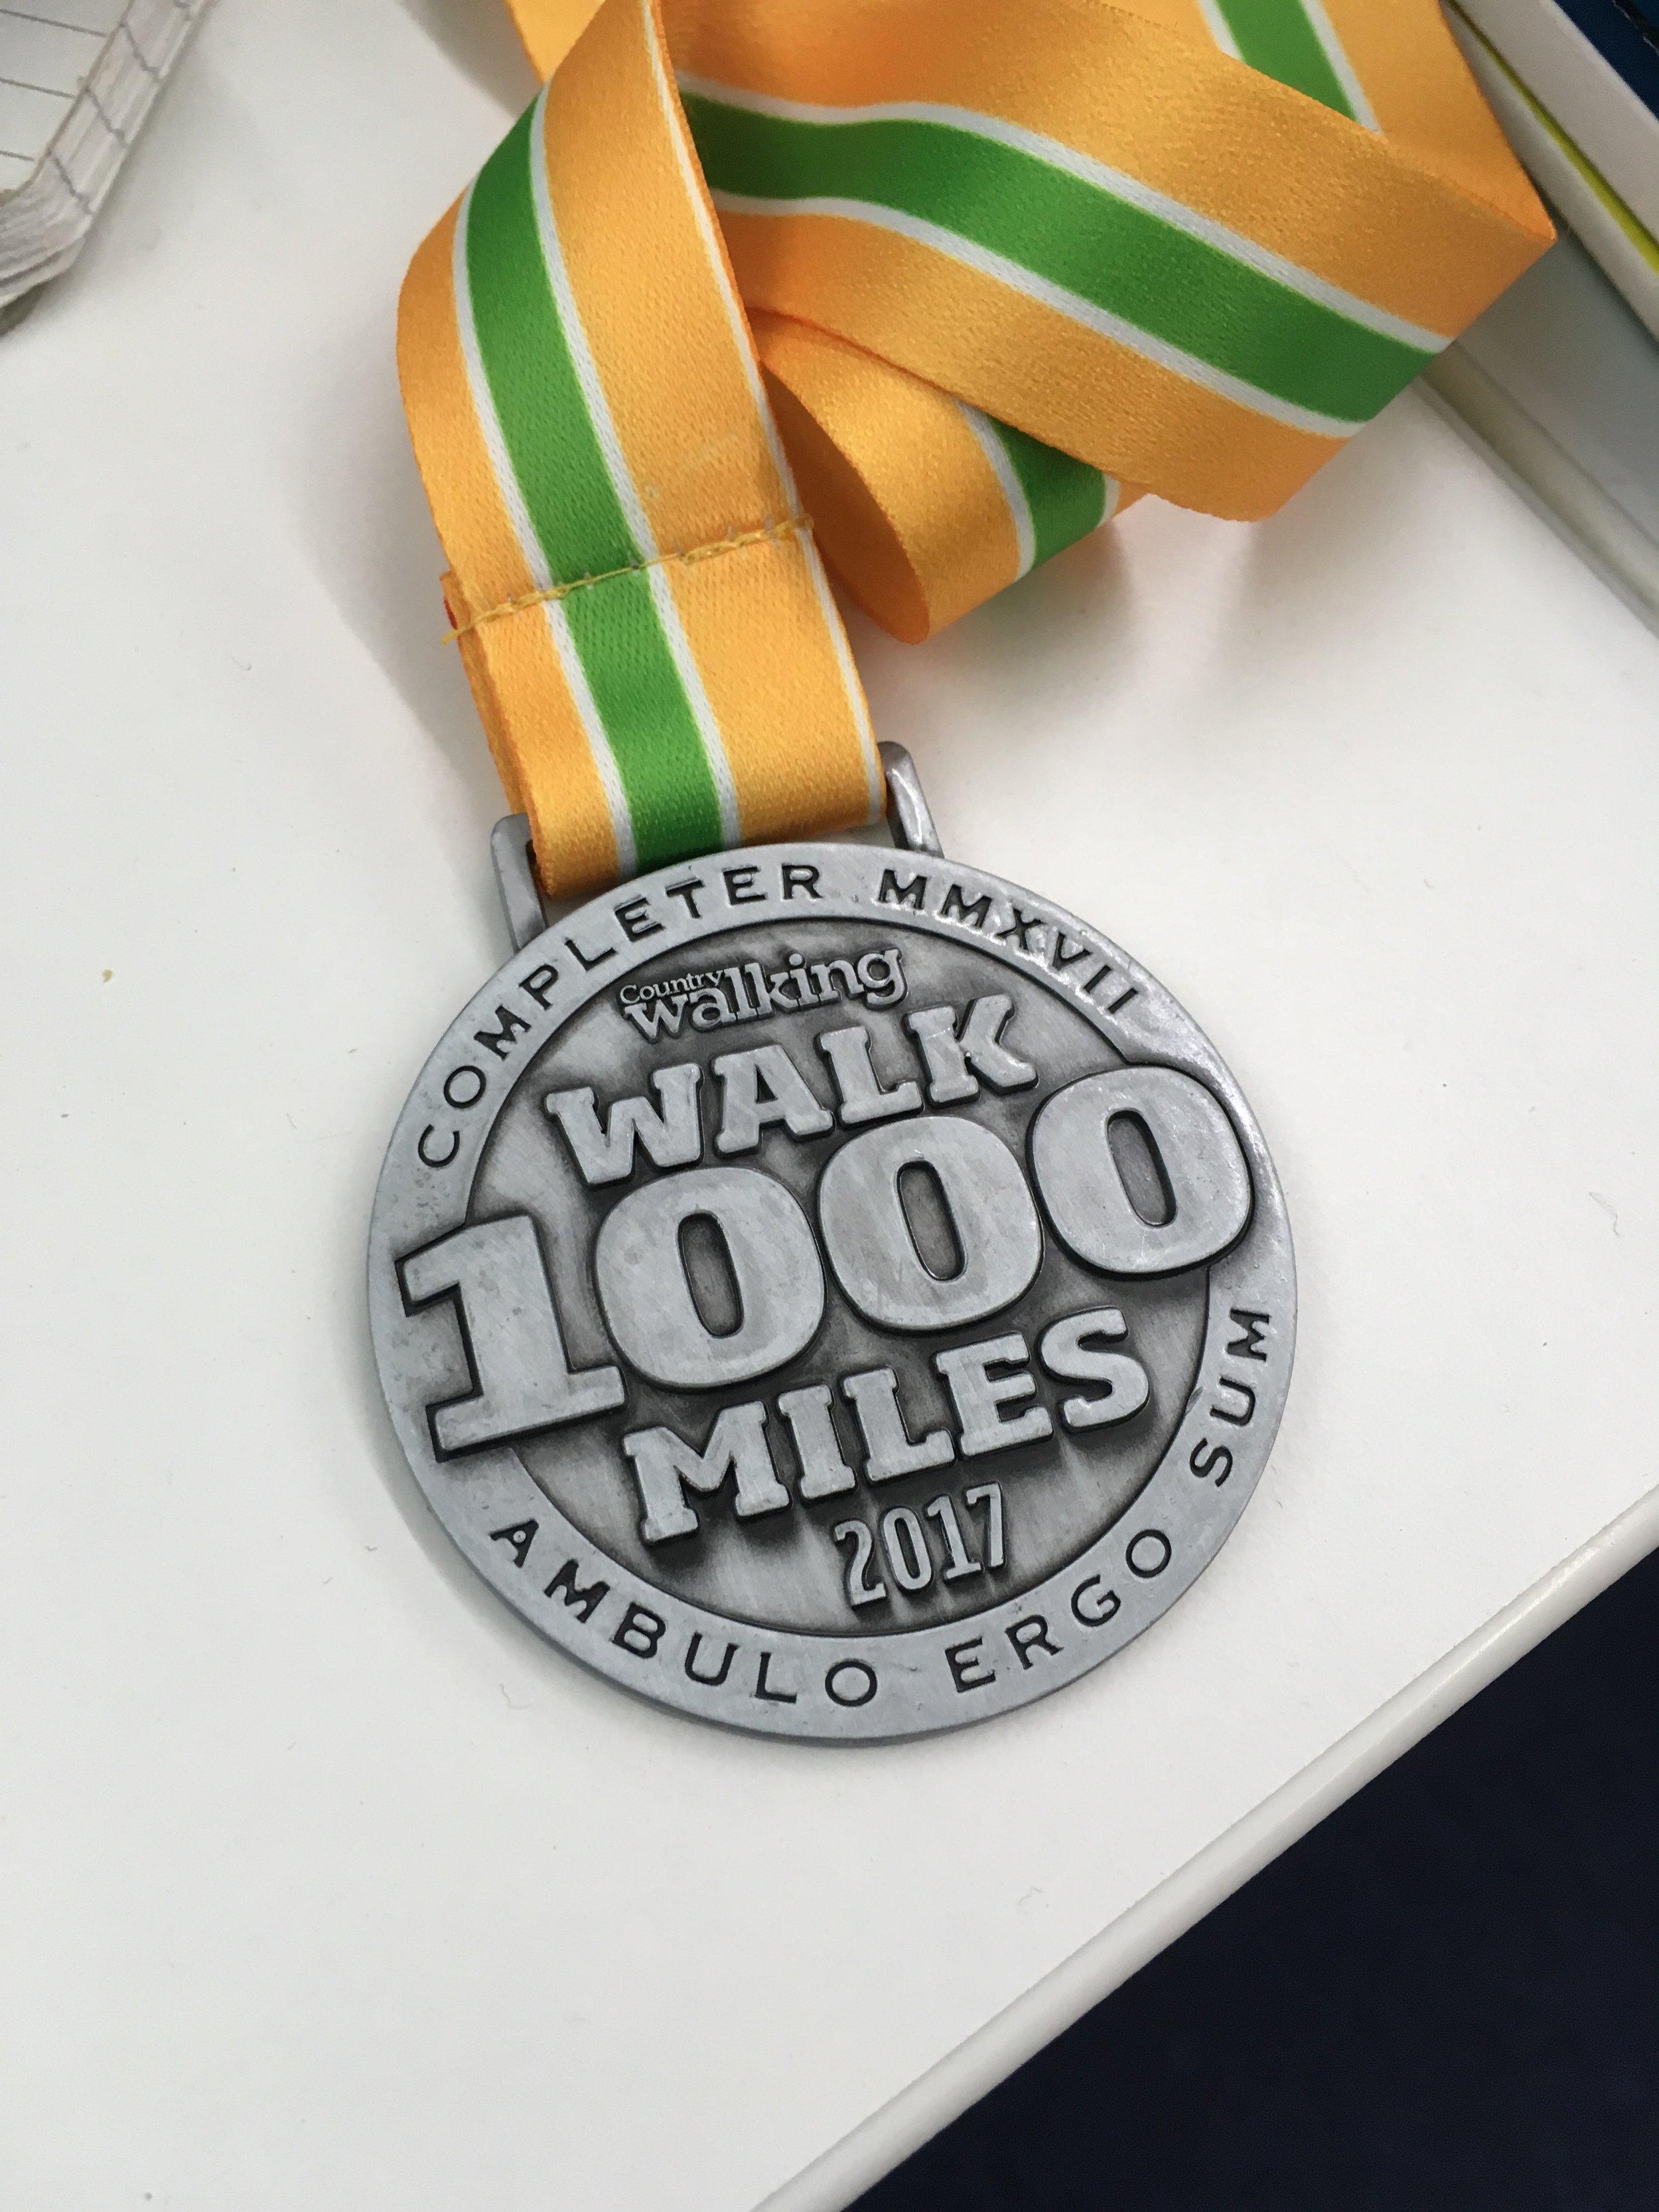 Last year's medal. New 2018 medal orders open soon.